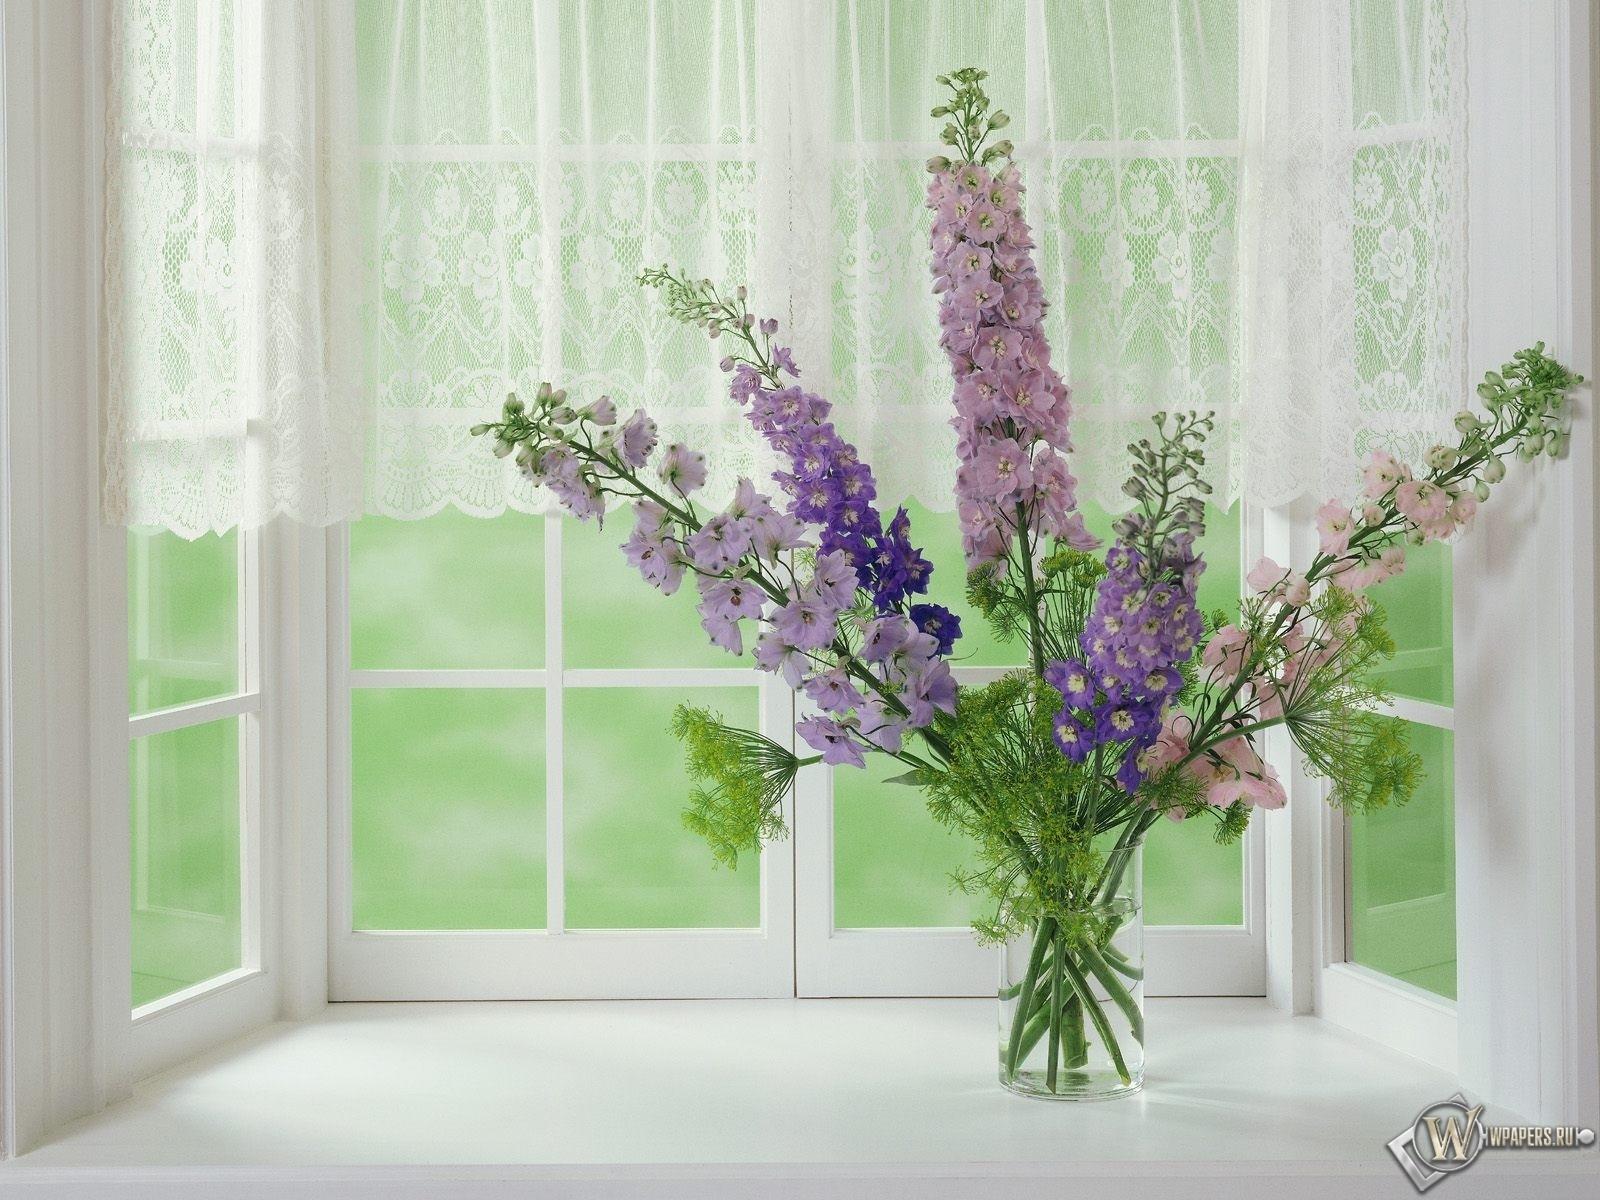 цветы на окне 1600x1200